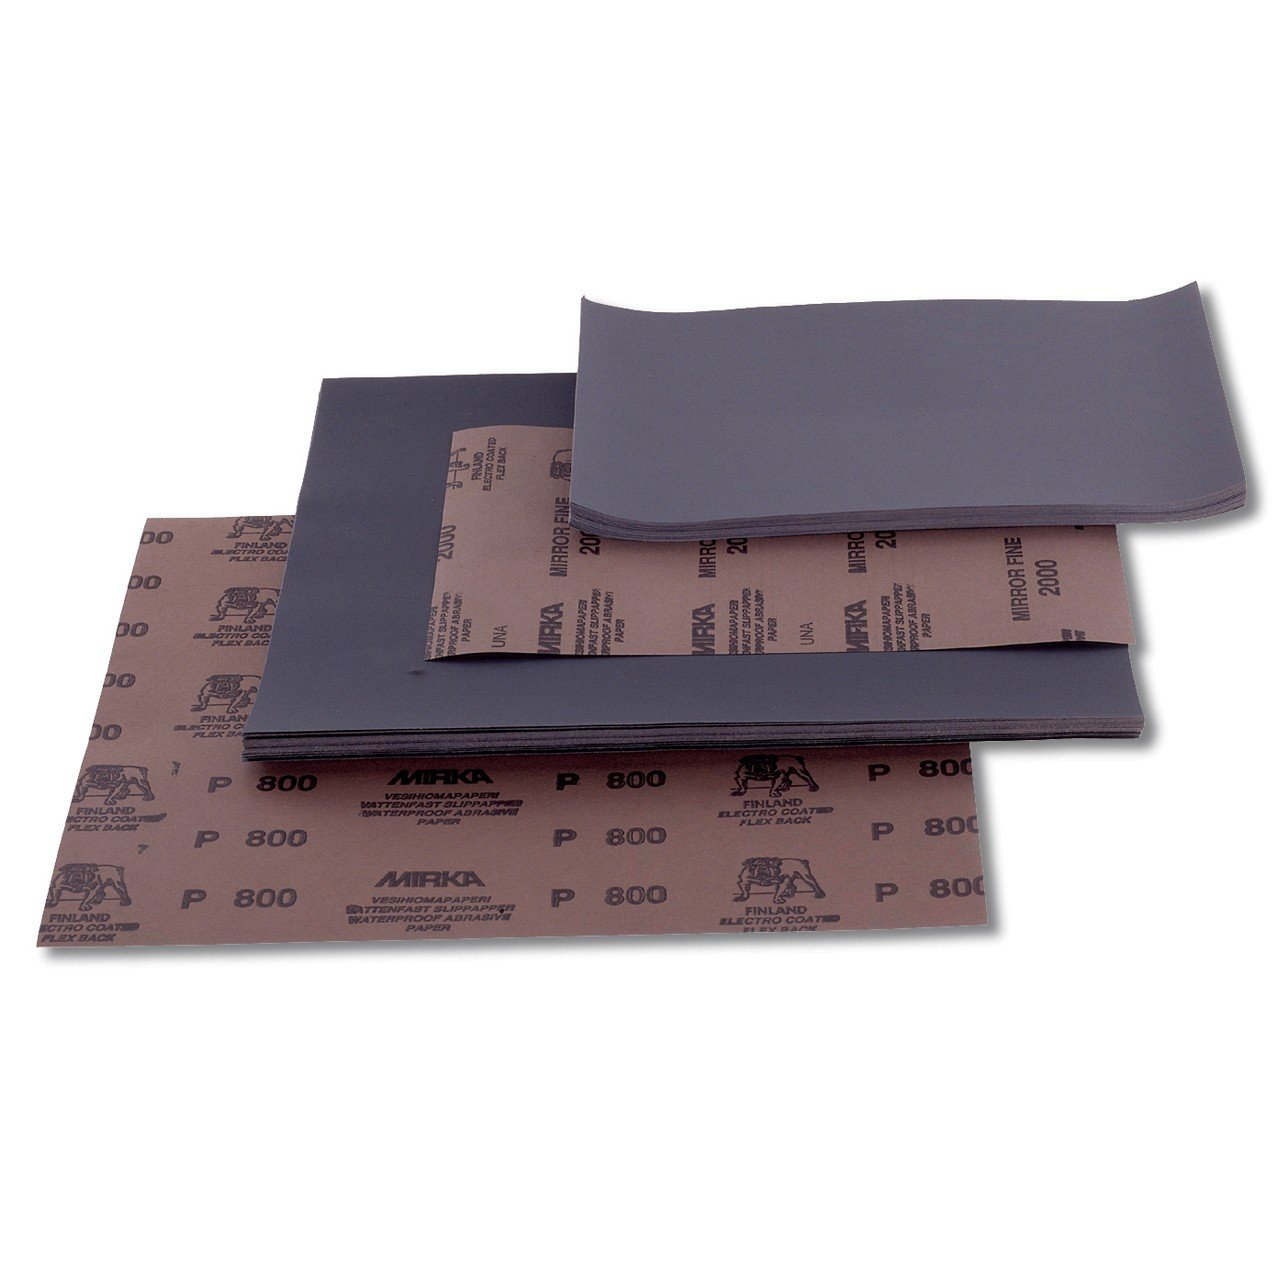 Mirka 2110105093 WPF Schleifmaterialien P1200, 50 Pro Pack, 230 x 280 mm